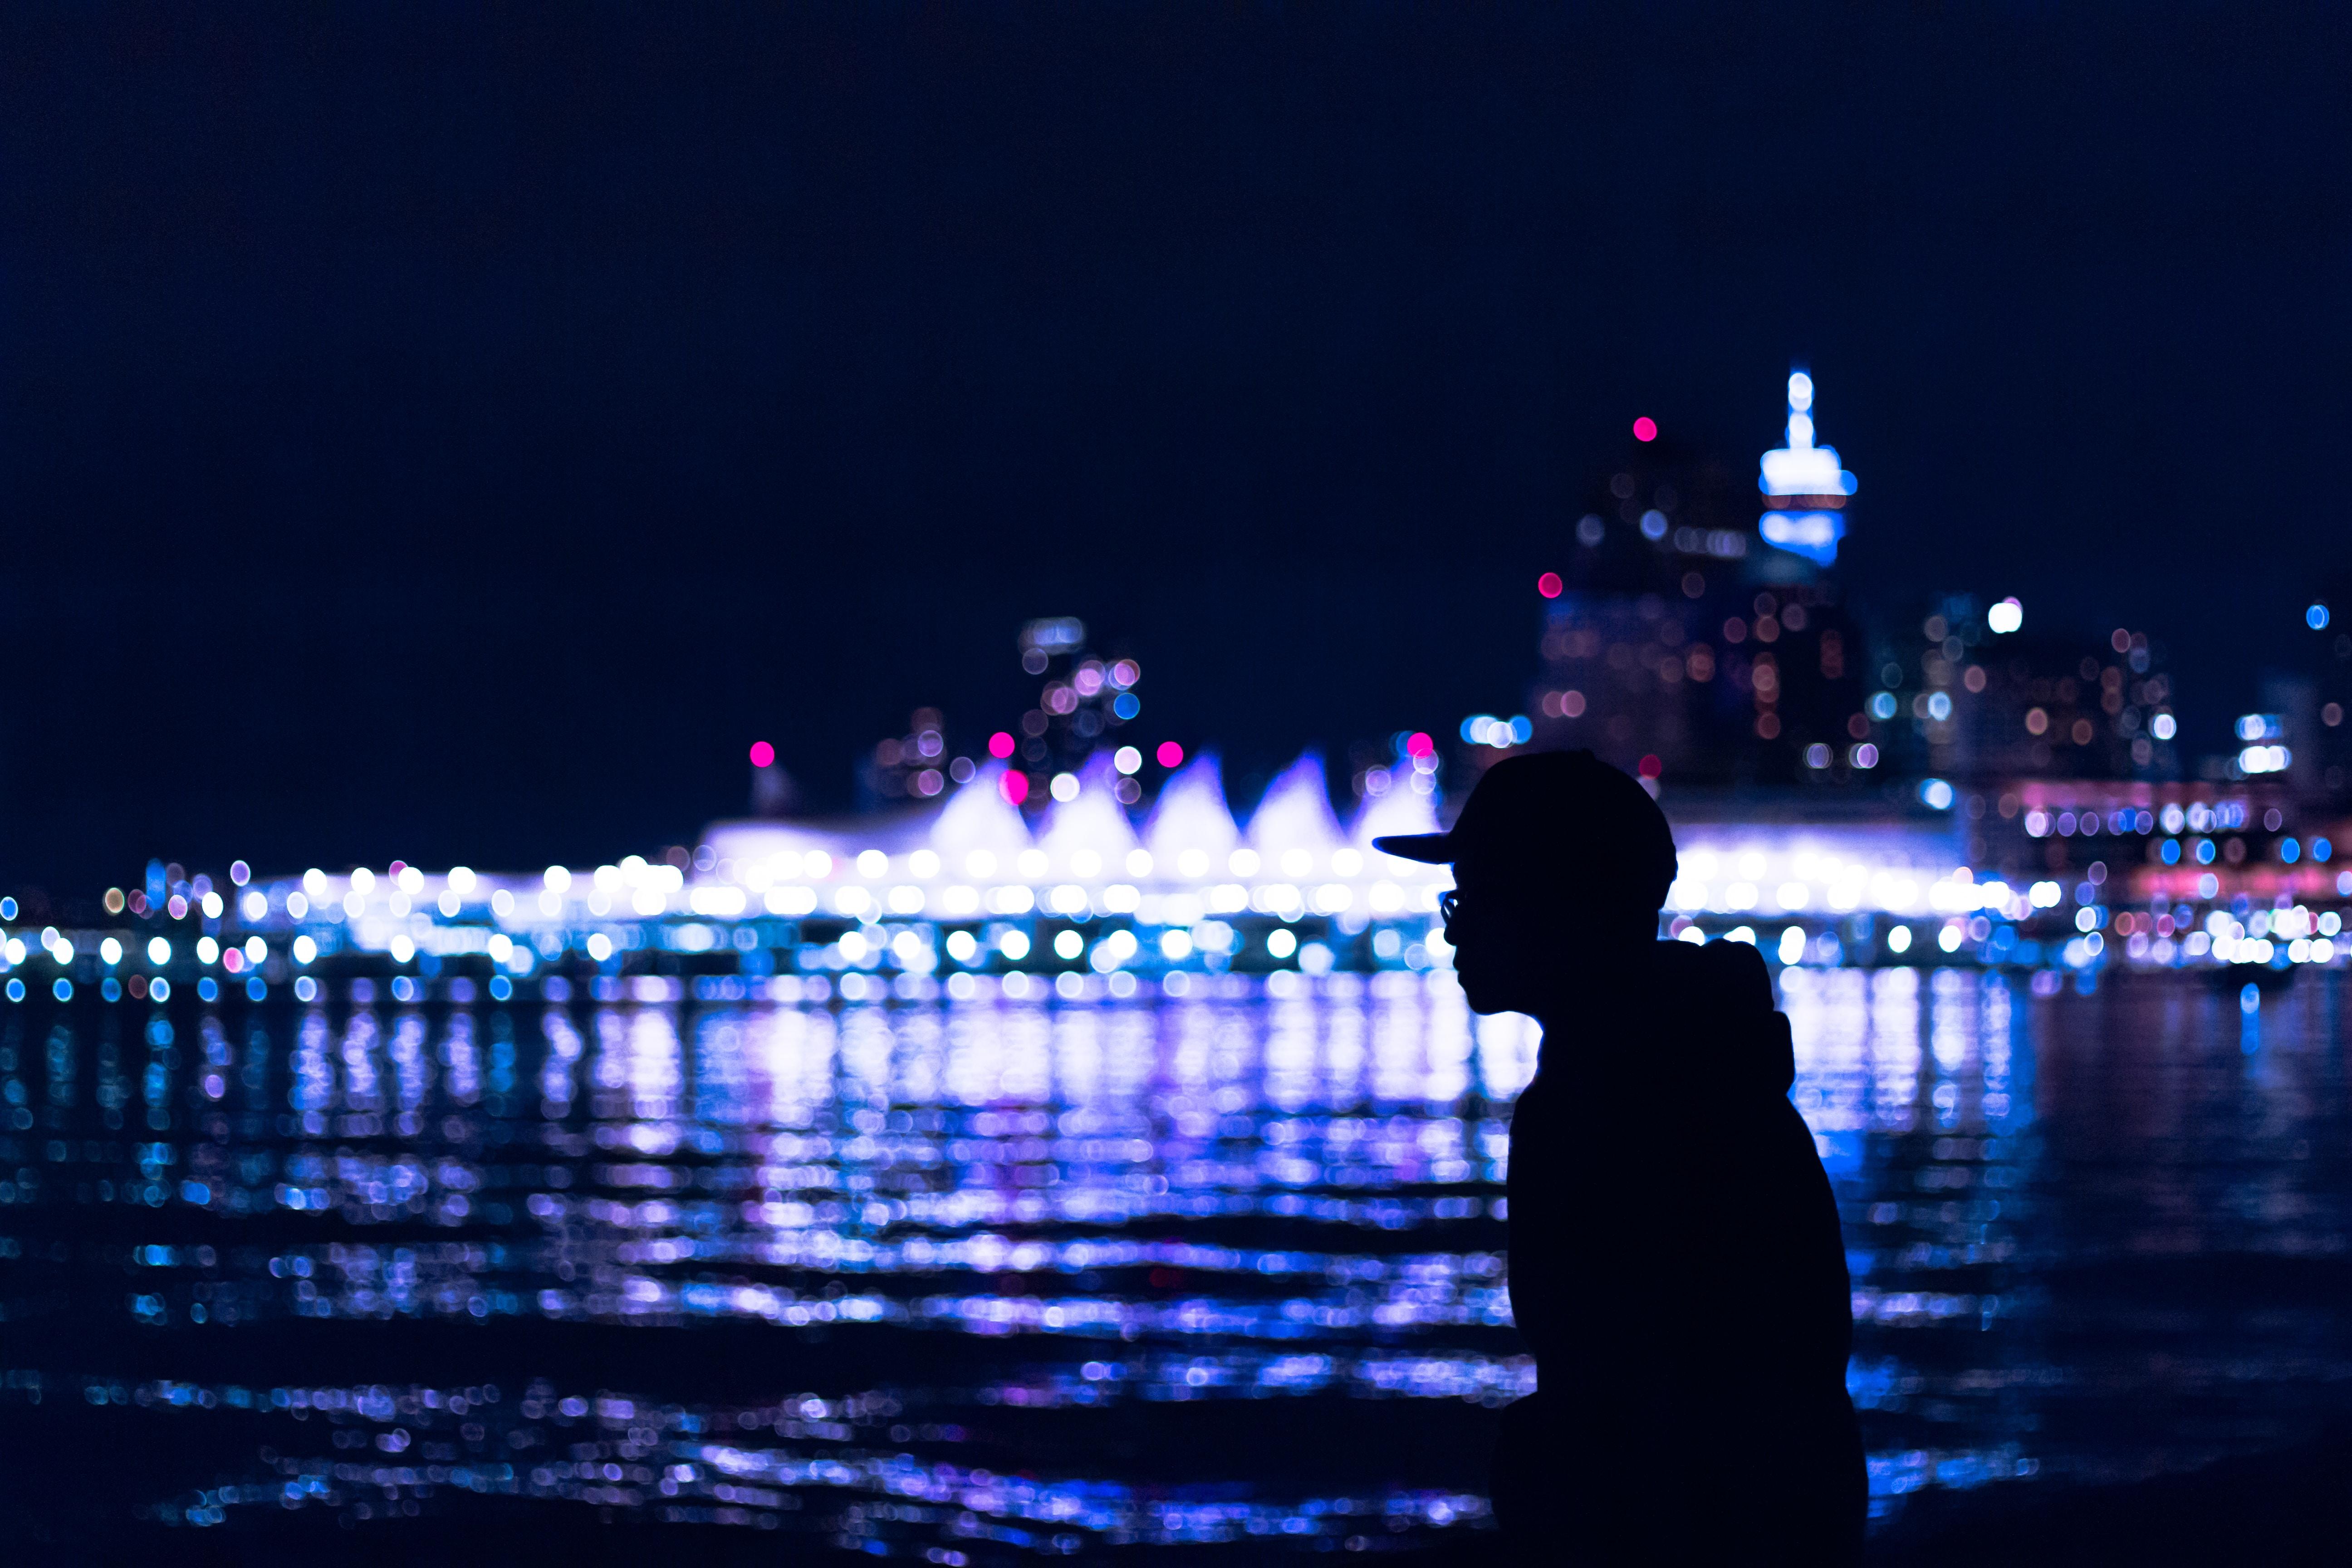 silhouette of man wearing hat standing near body of water